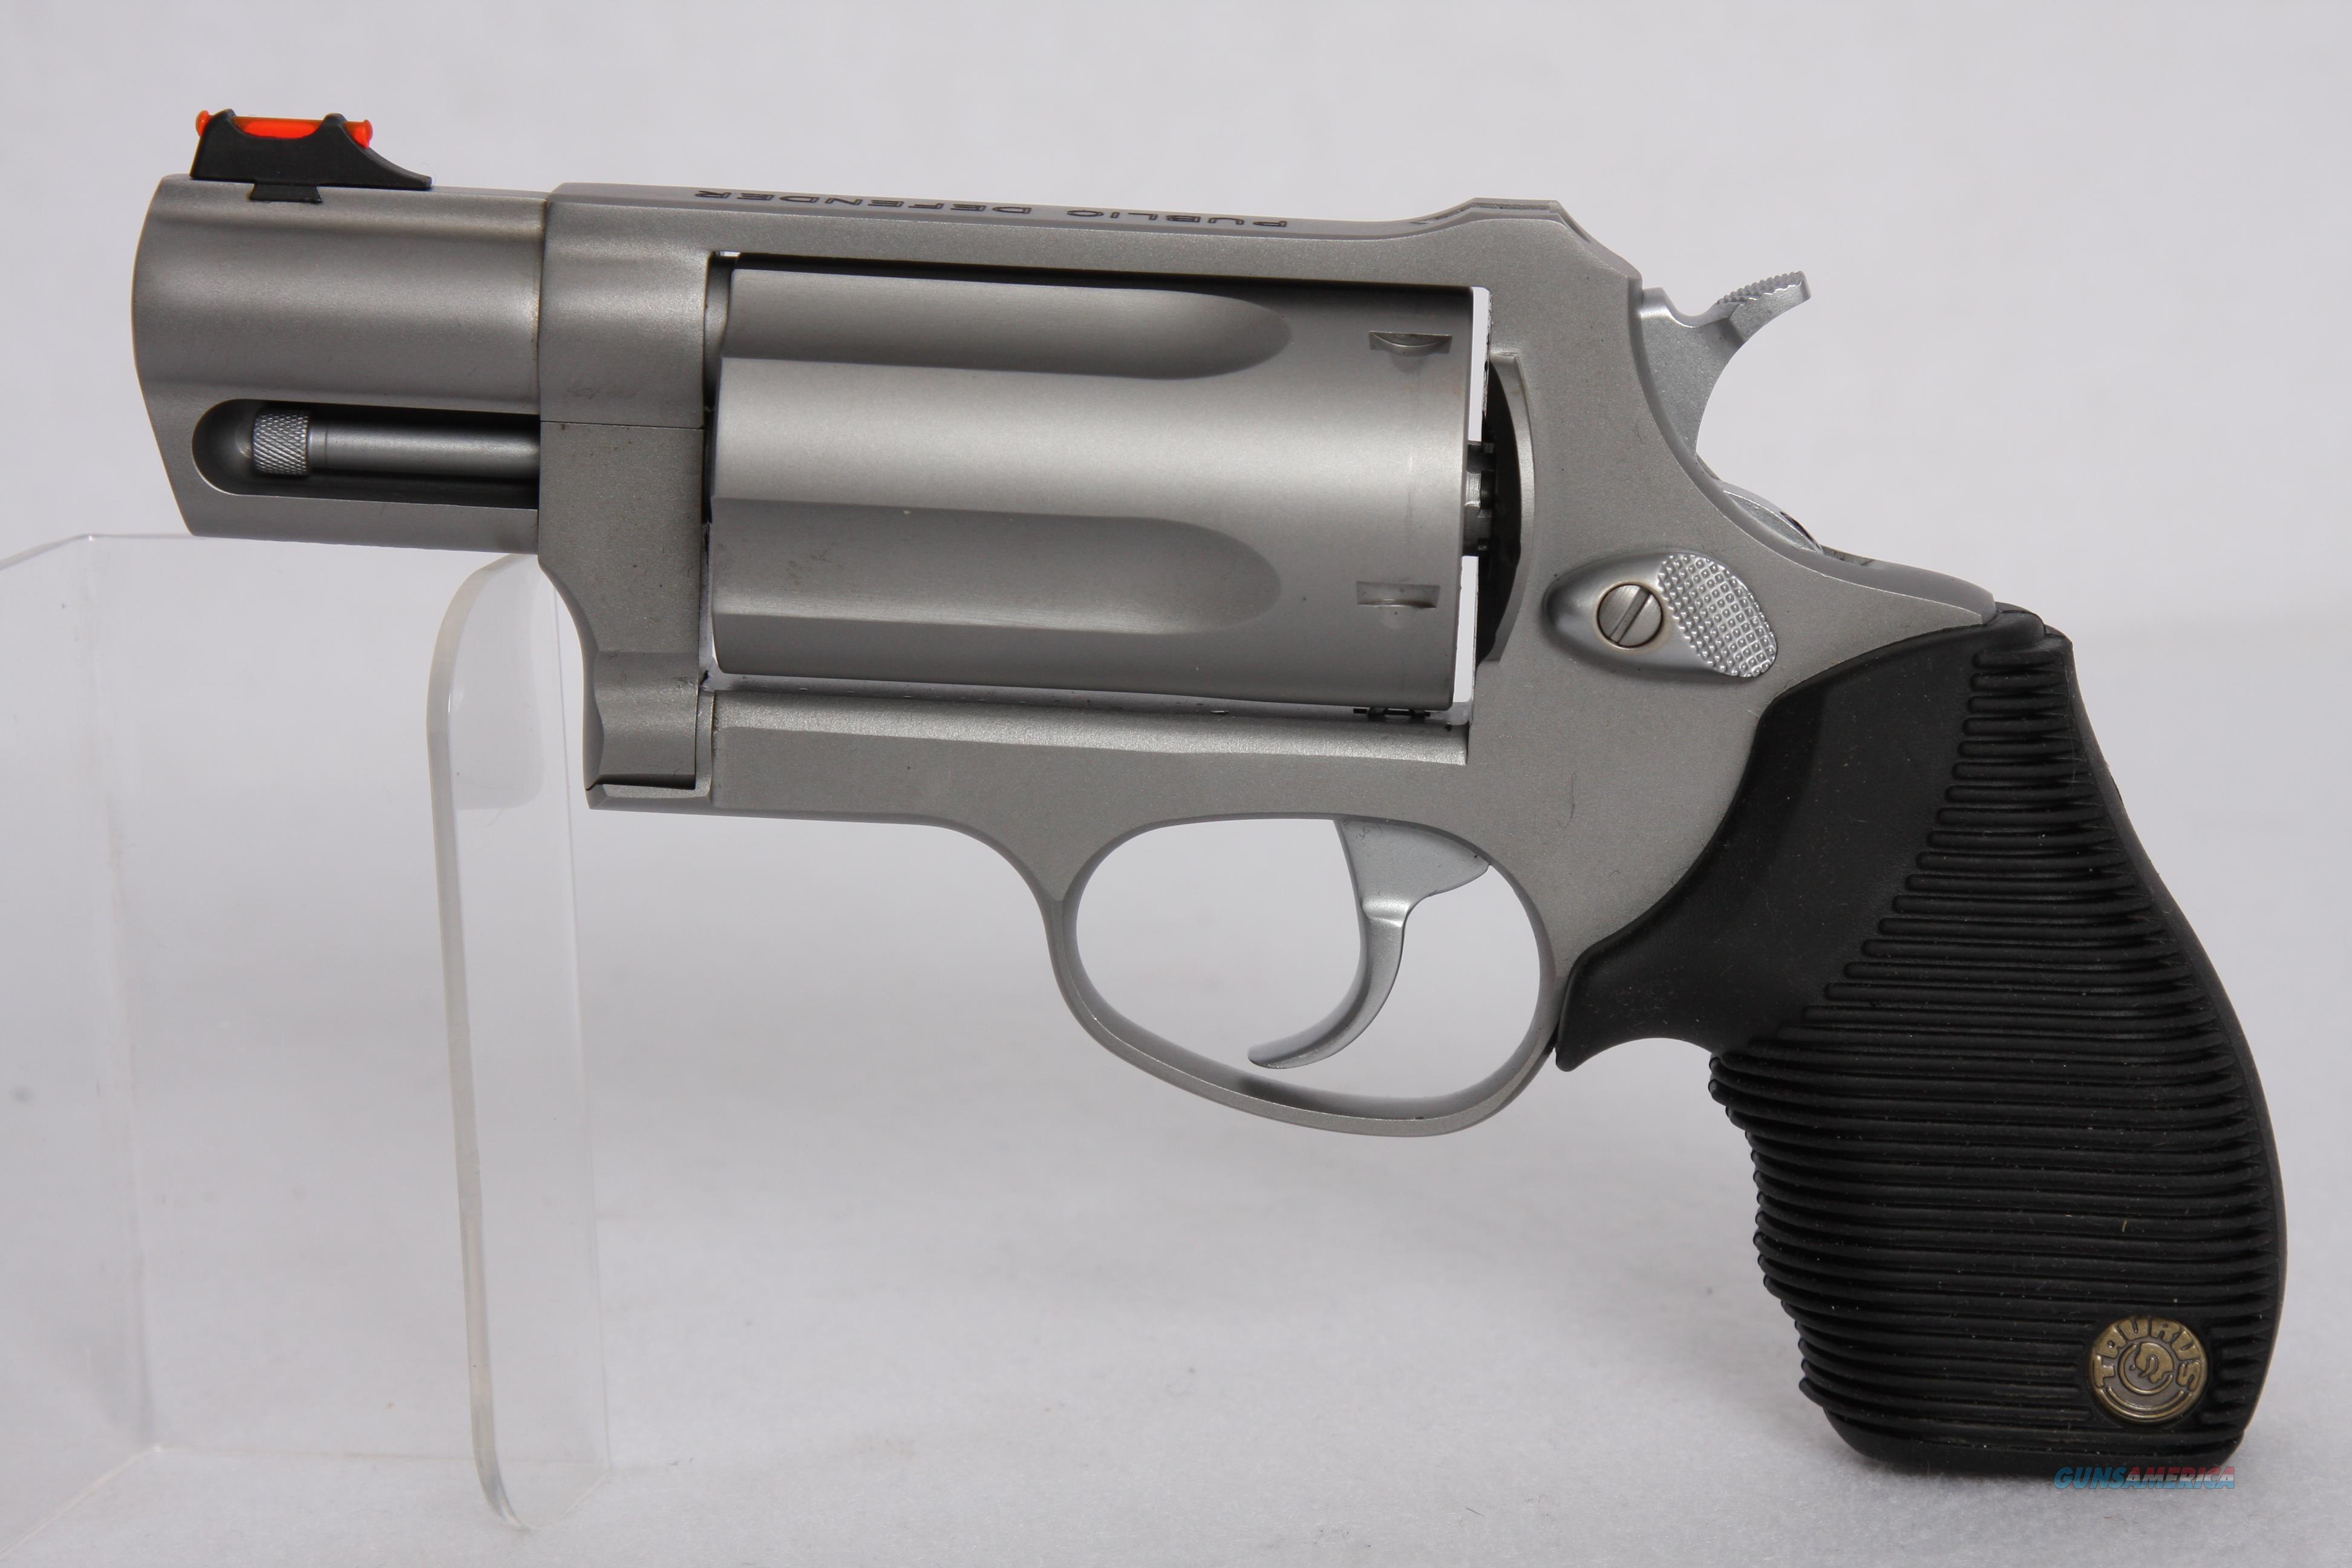 Taurus Judge Public Defender 2.5in SS  Guns > Pistols > Taurus Pistols > Revolvers